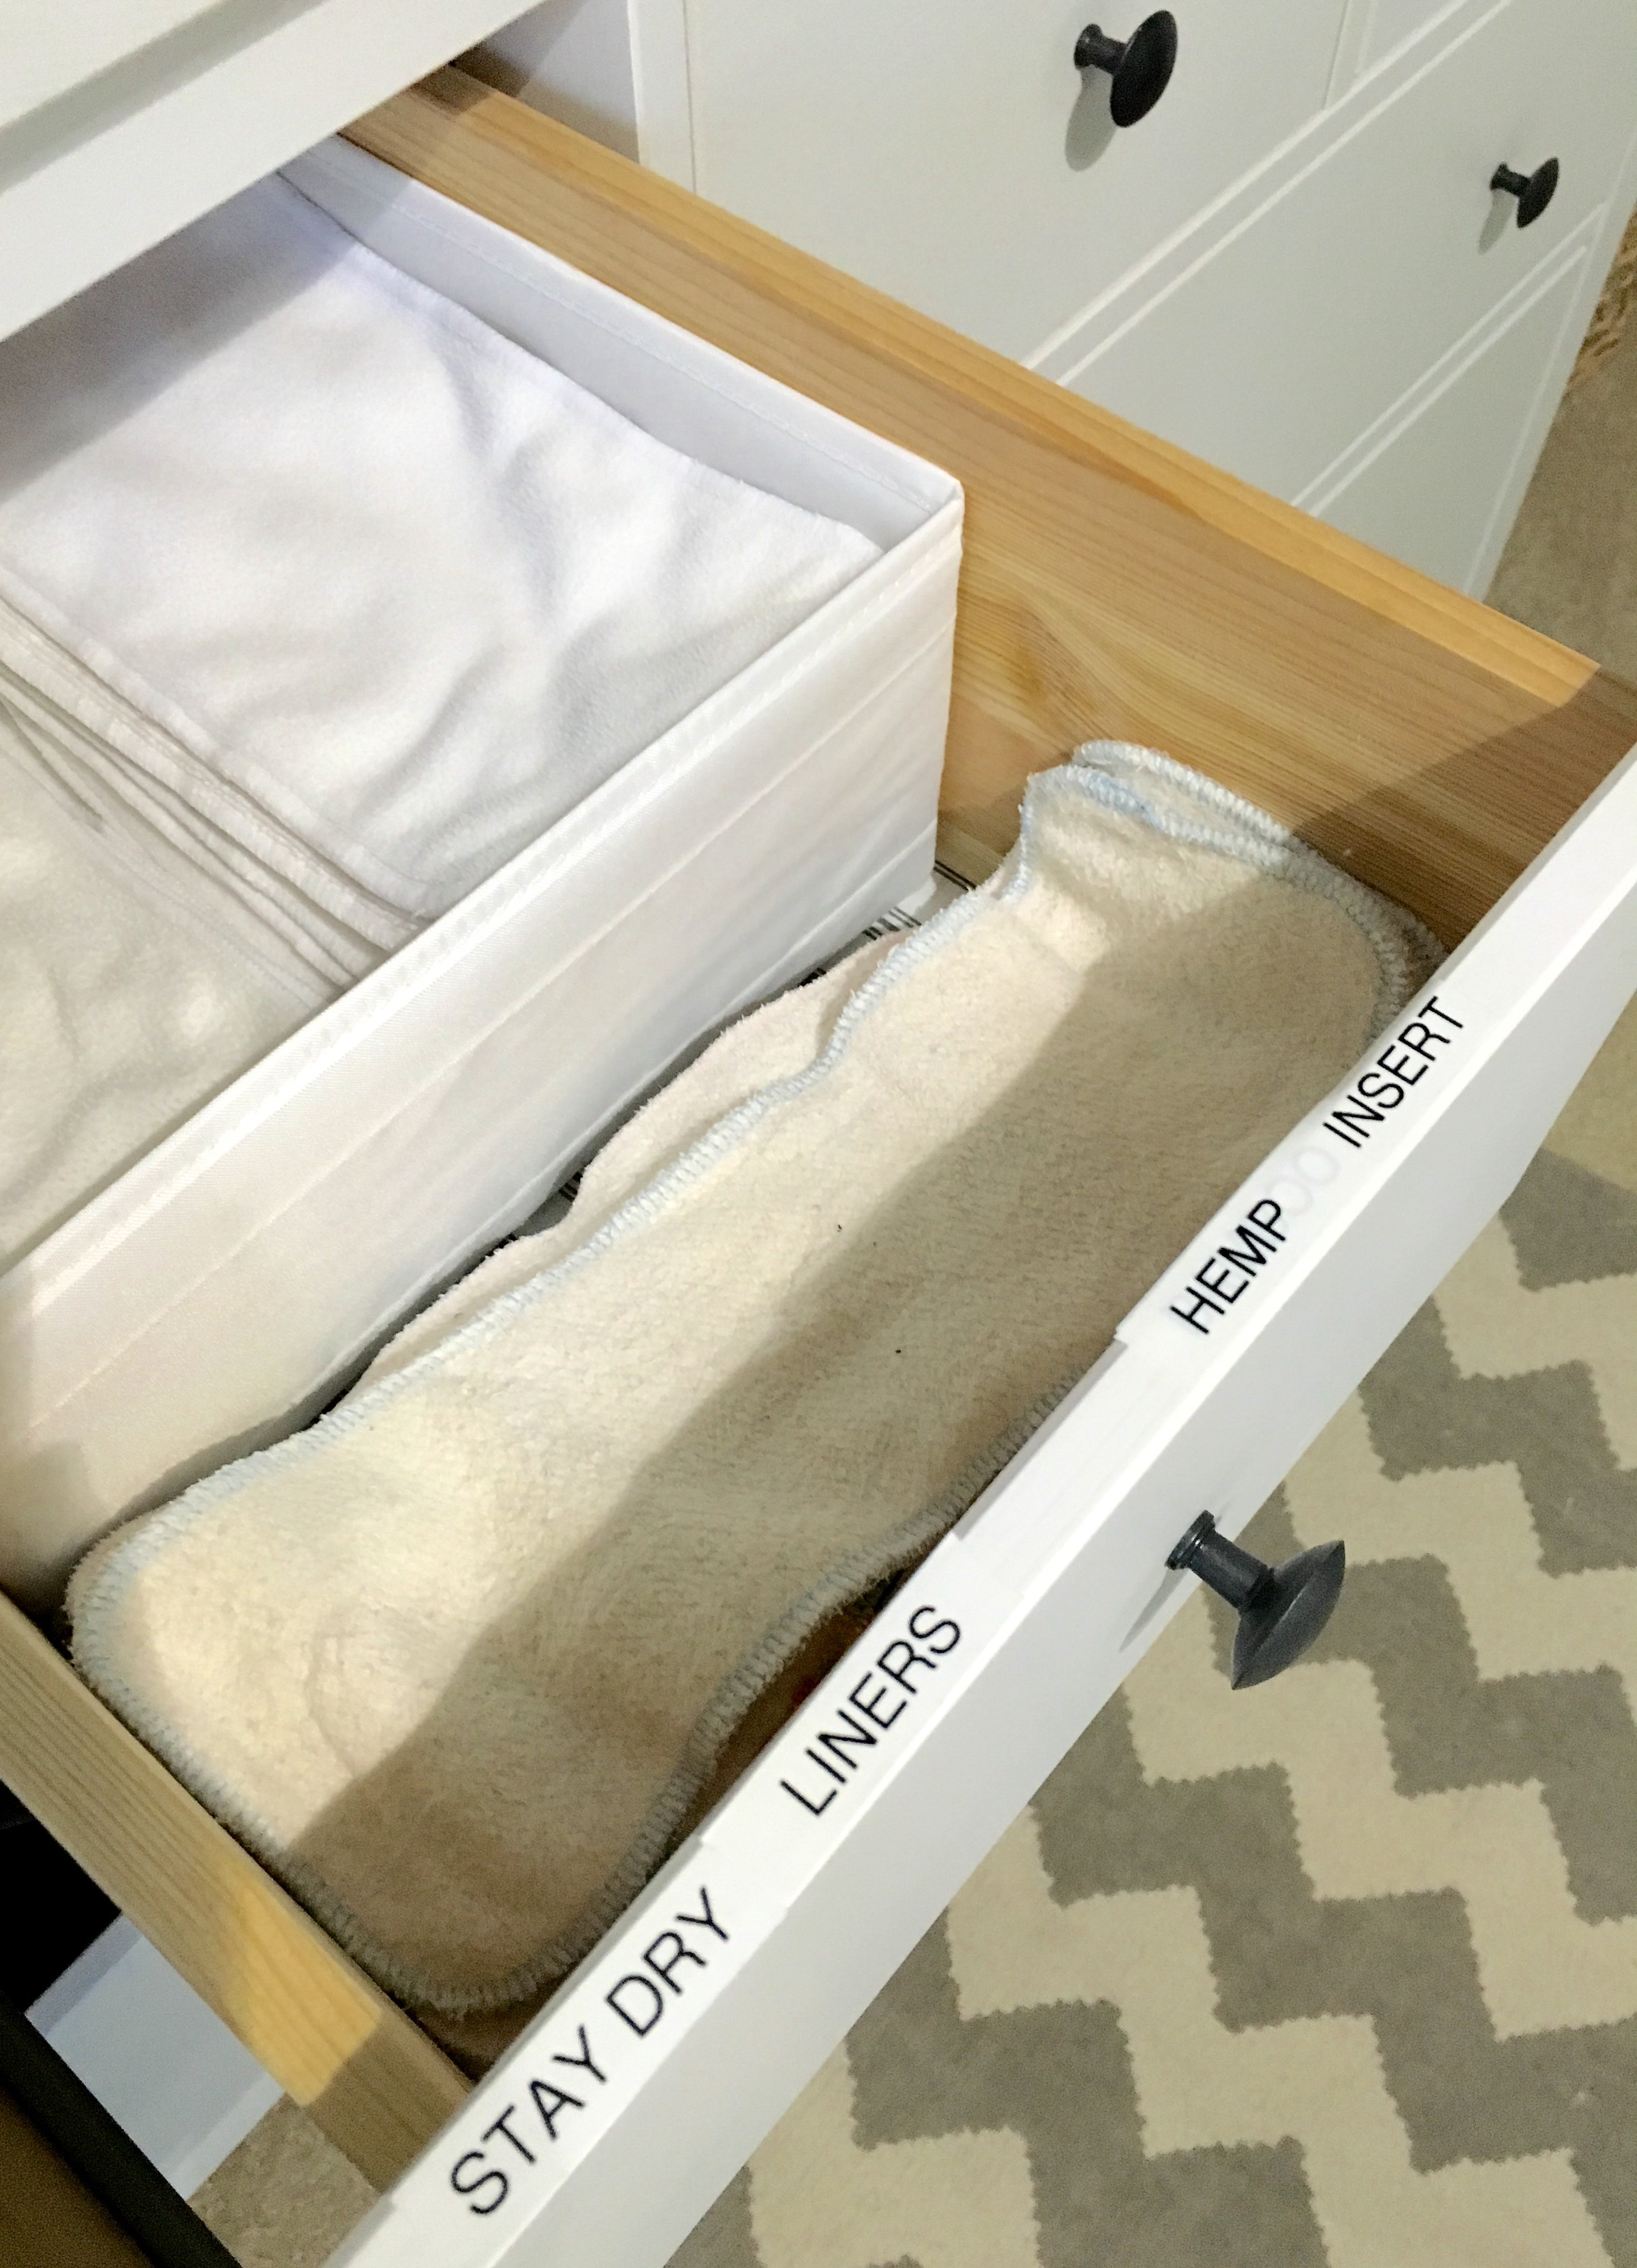 Nursery Dresser Organization | dresser organization | nursery | nursery dresser | baby | baby organization | Ikea dresser | how to organize a baby's dresser | nursery decor | baby decor